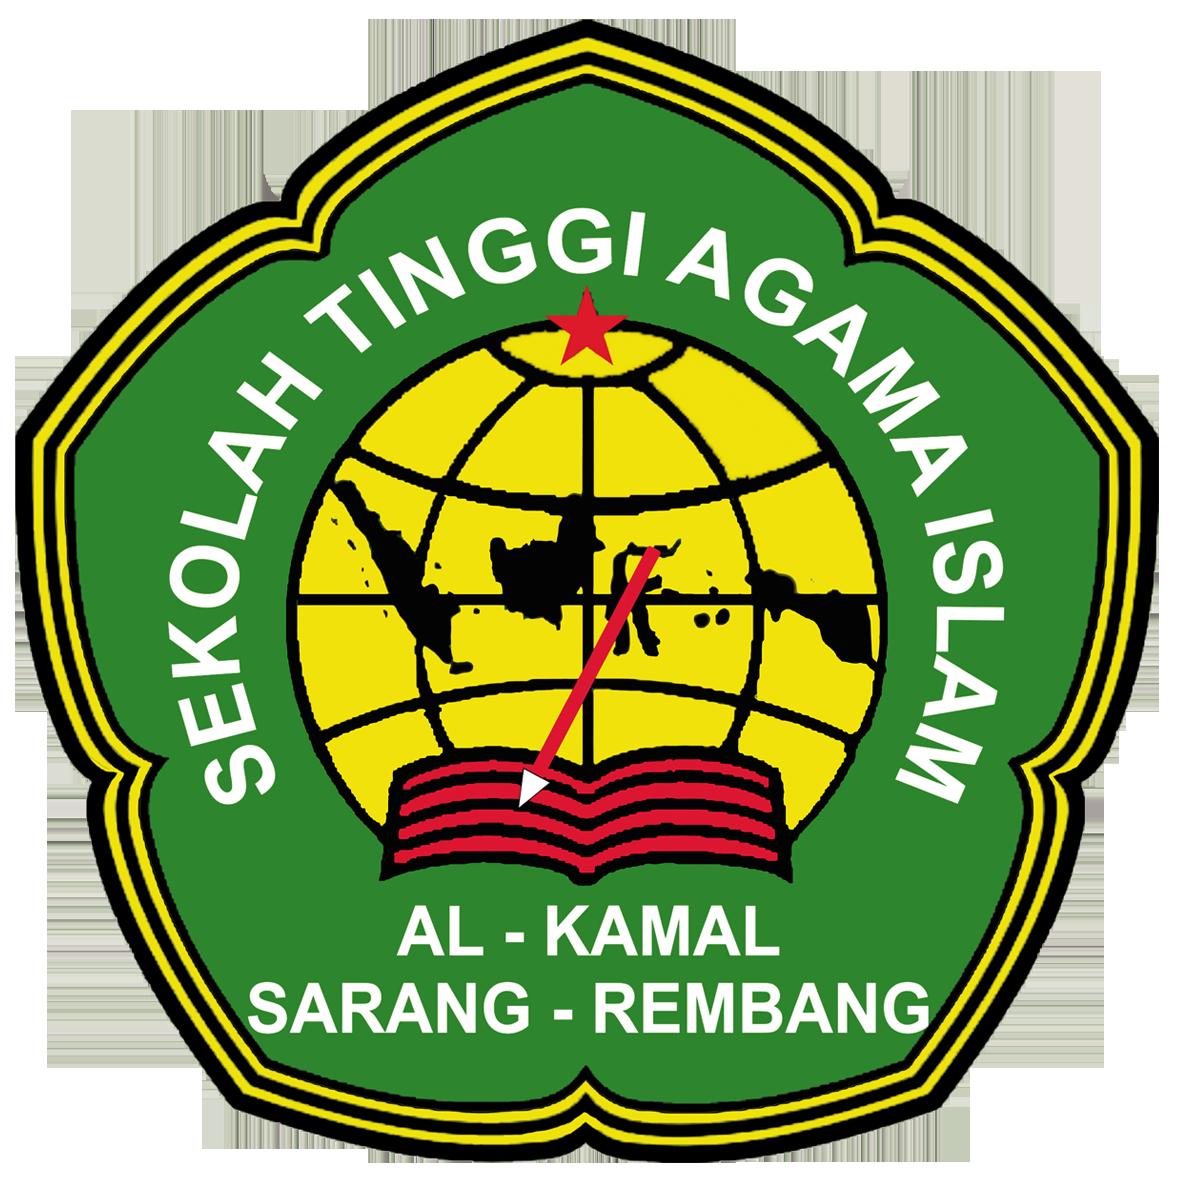 STAI Al-Kamal Sarang Rembang